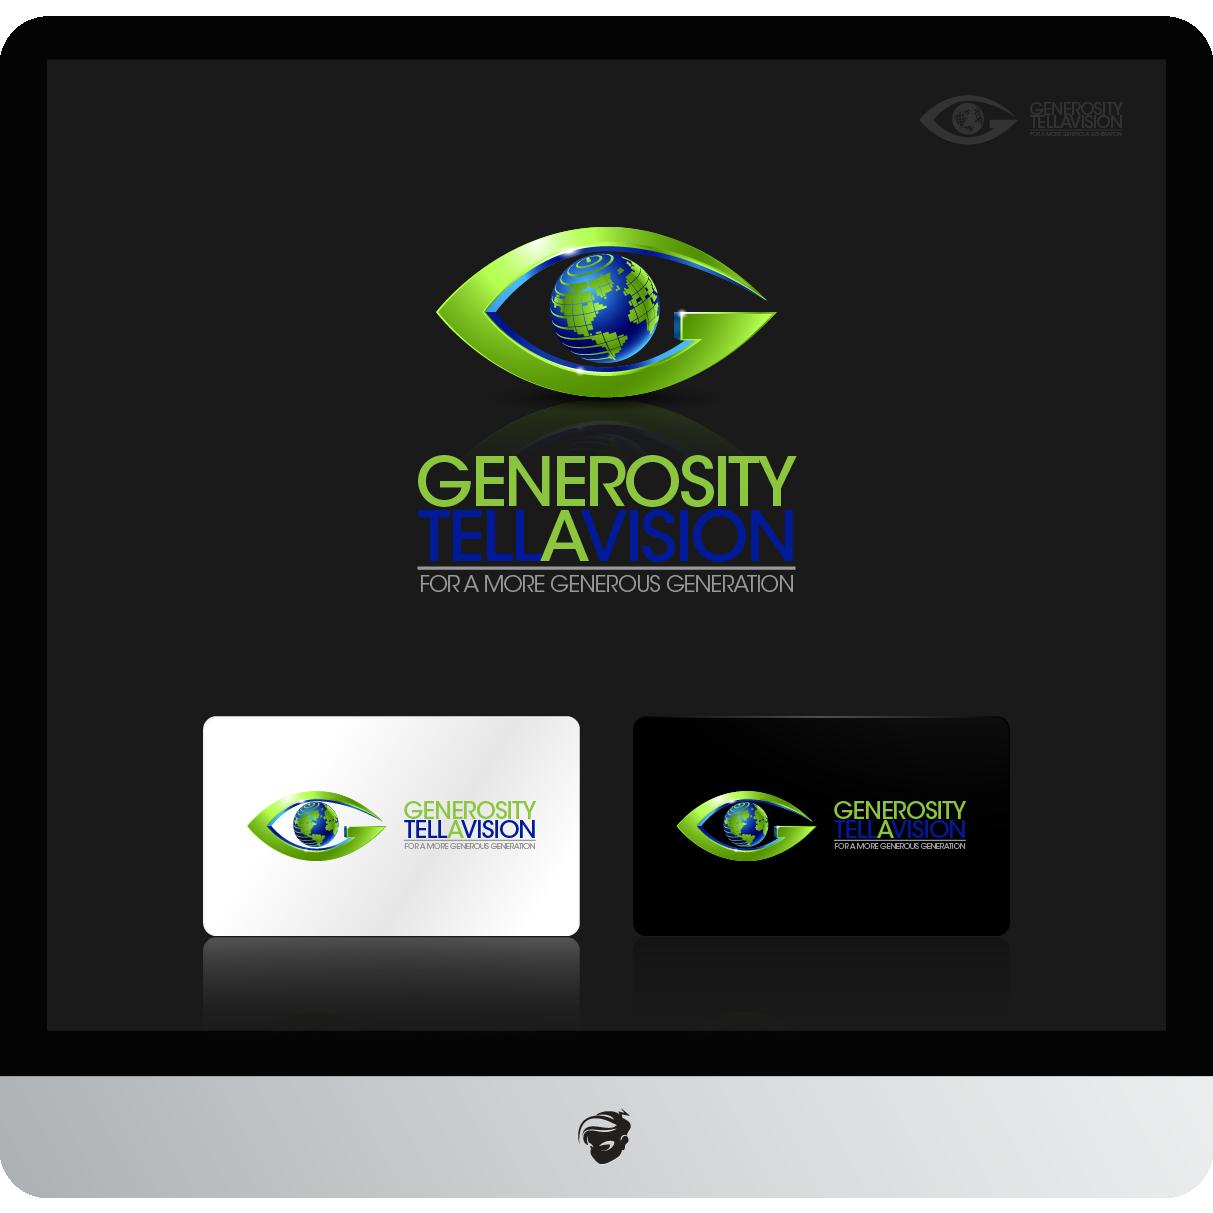 Logo Design by zesthar - Entry No. 115 in the Logo Design Contest Artistic Logo Design for Generosity TellAVision.